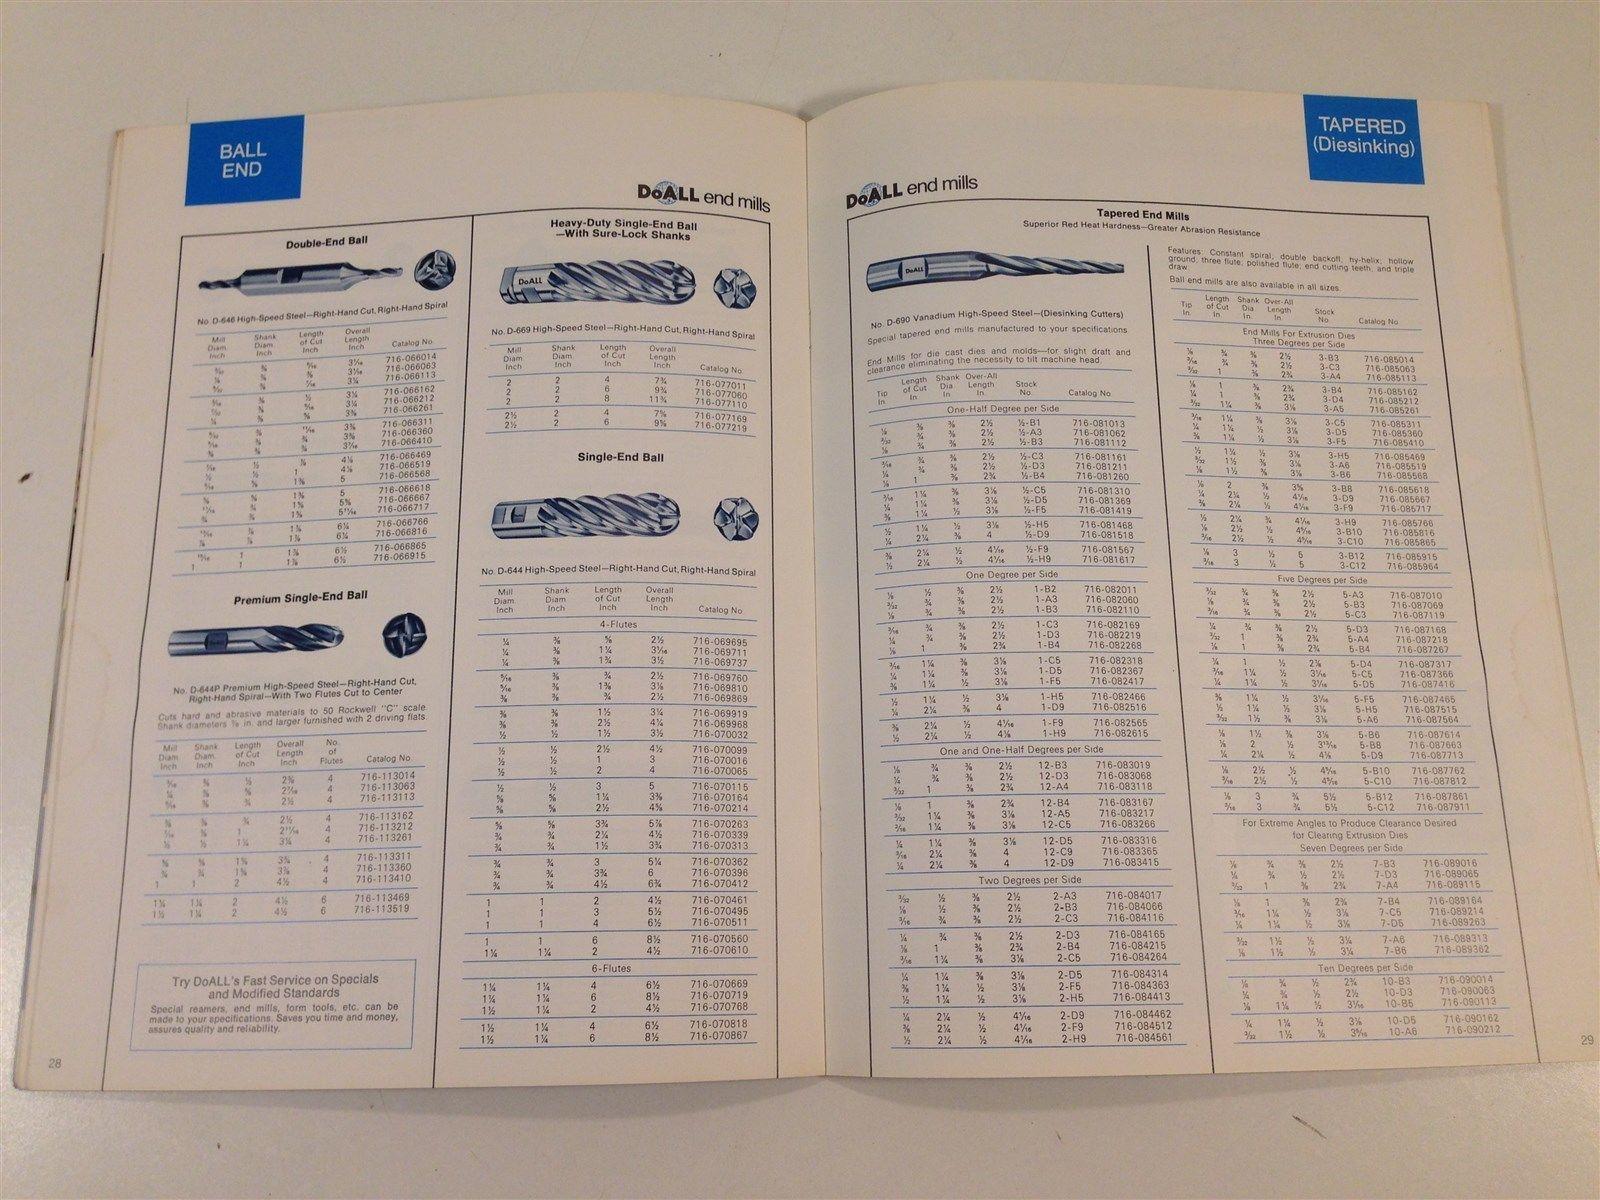 Vintage 1977 DoAll World's Finest End Mills Catalog